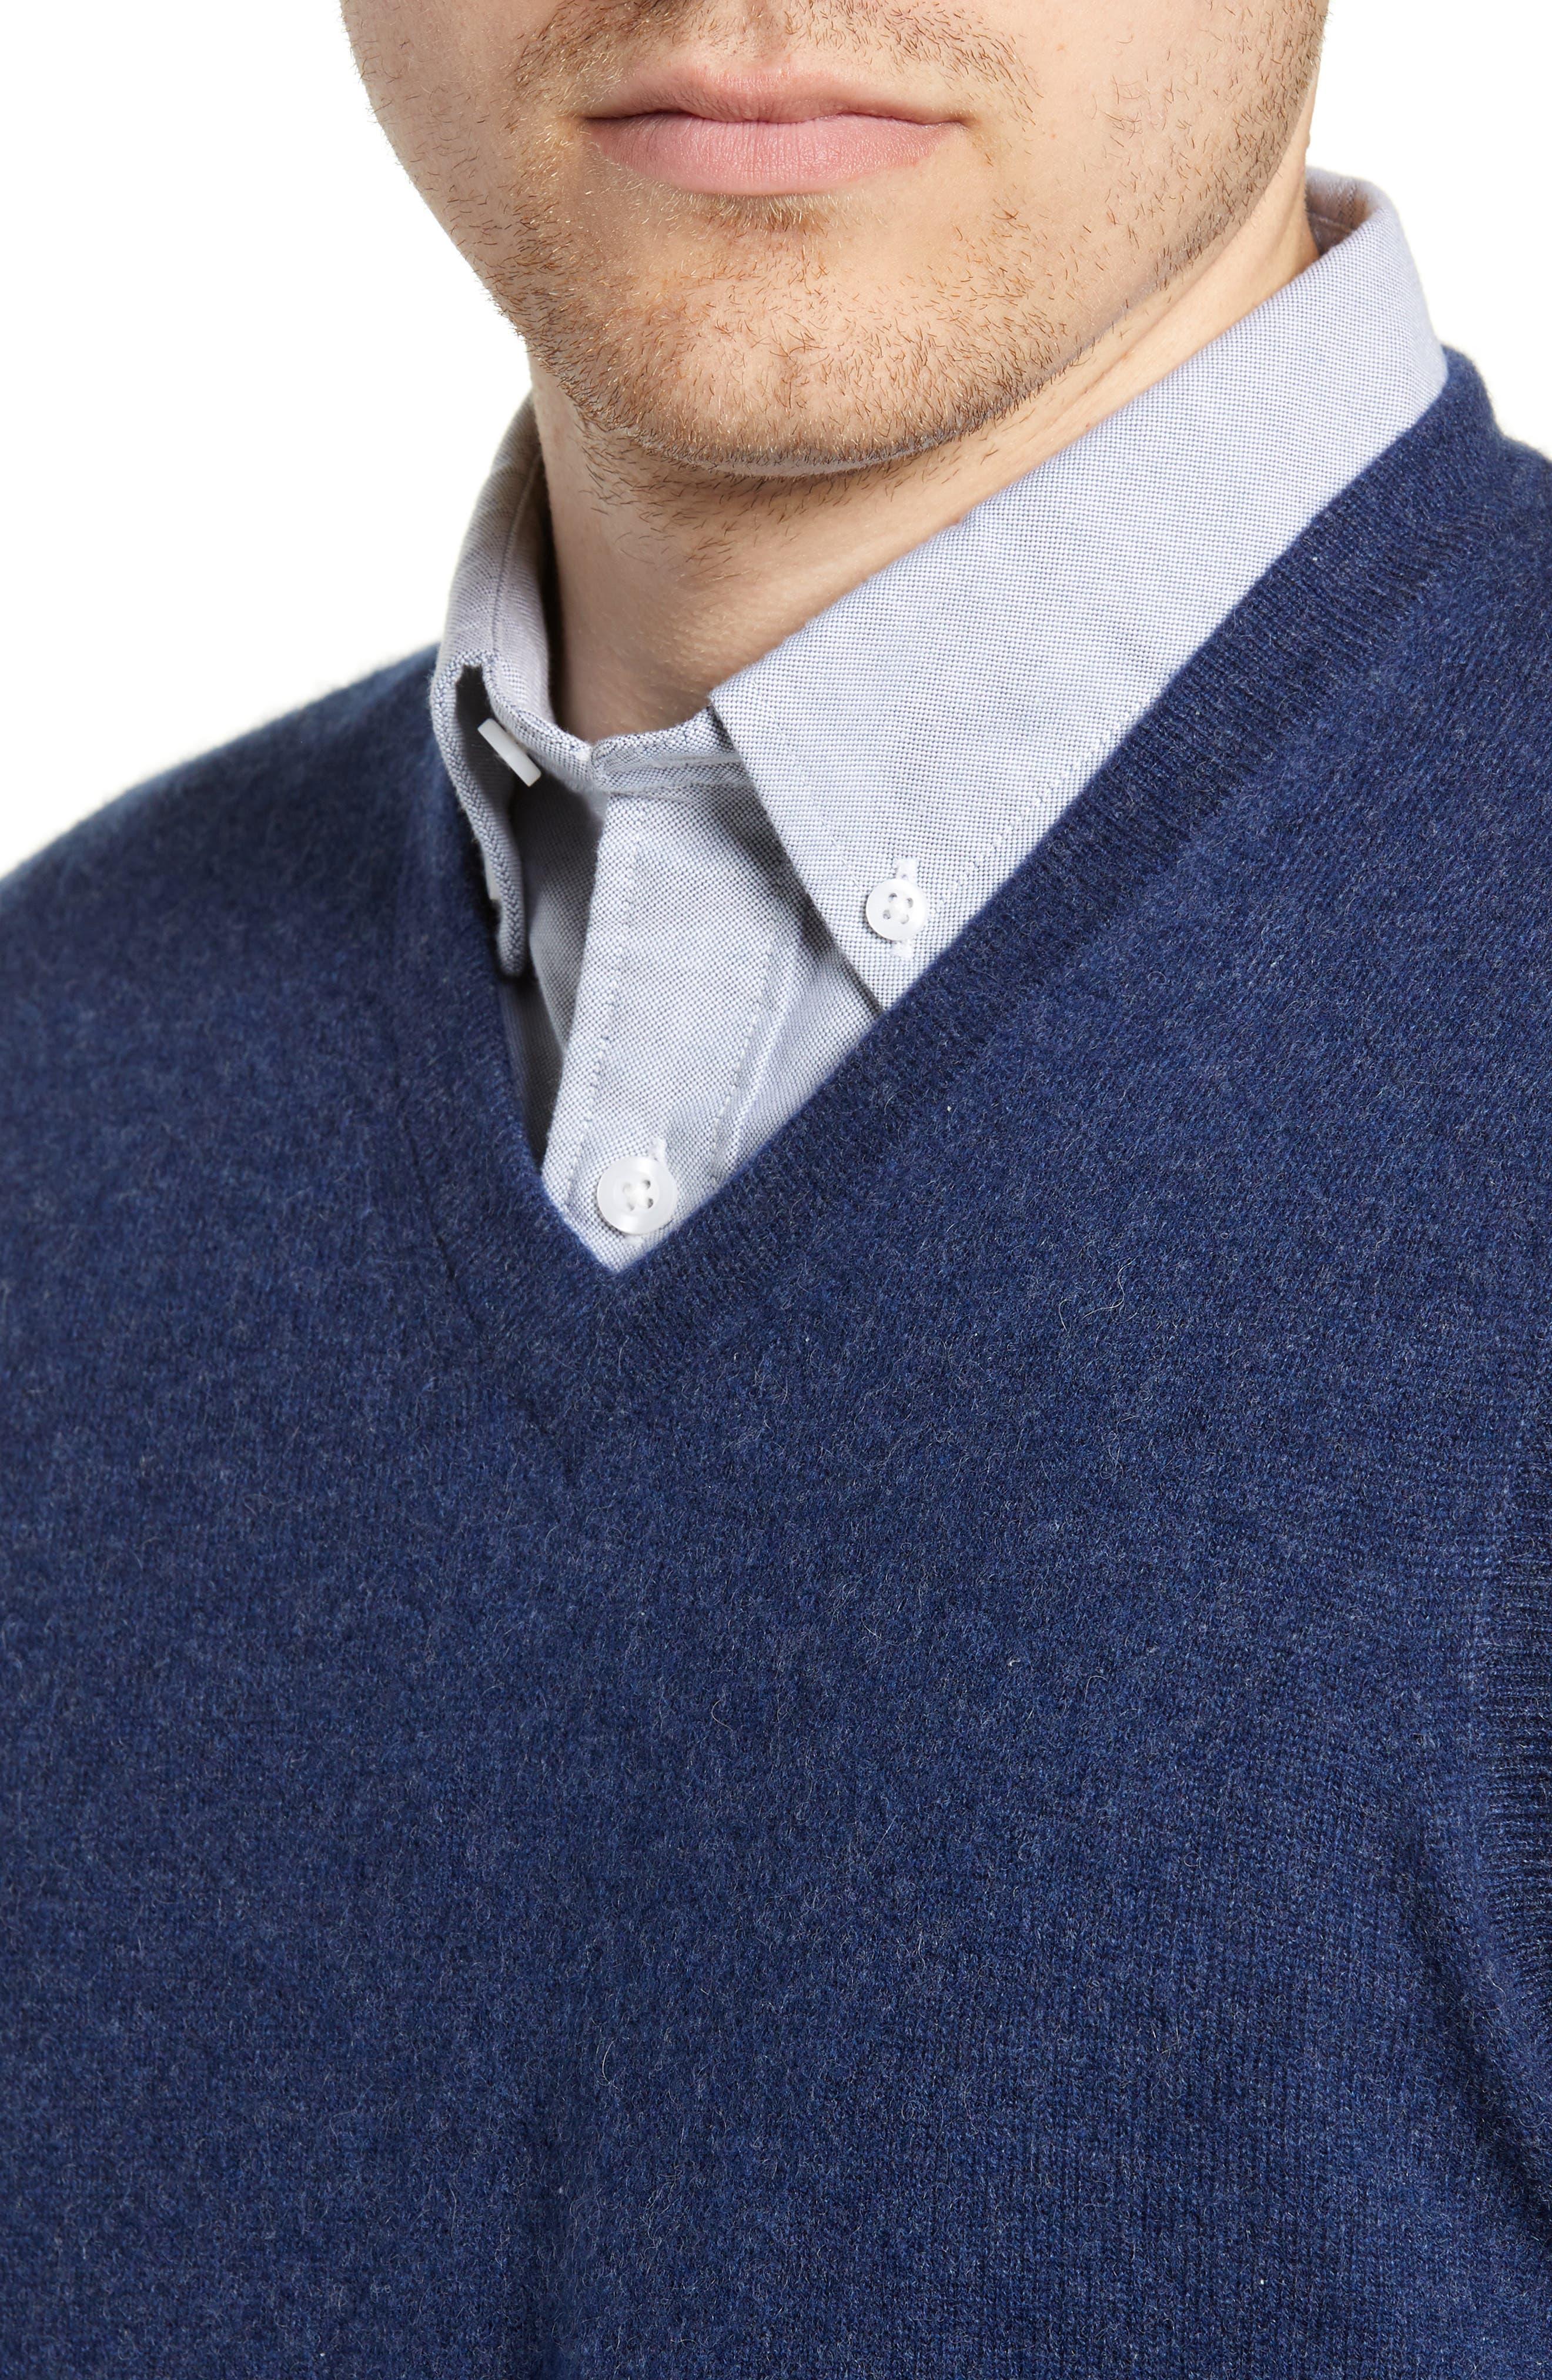 Cashmere V-Neck Sweater Vest,                             Alternate thumbnail 4, color,                             420